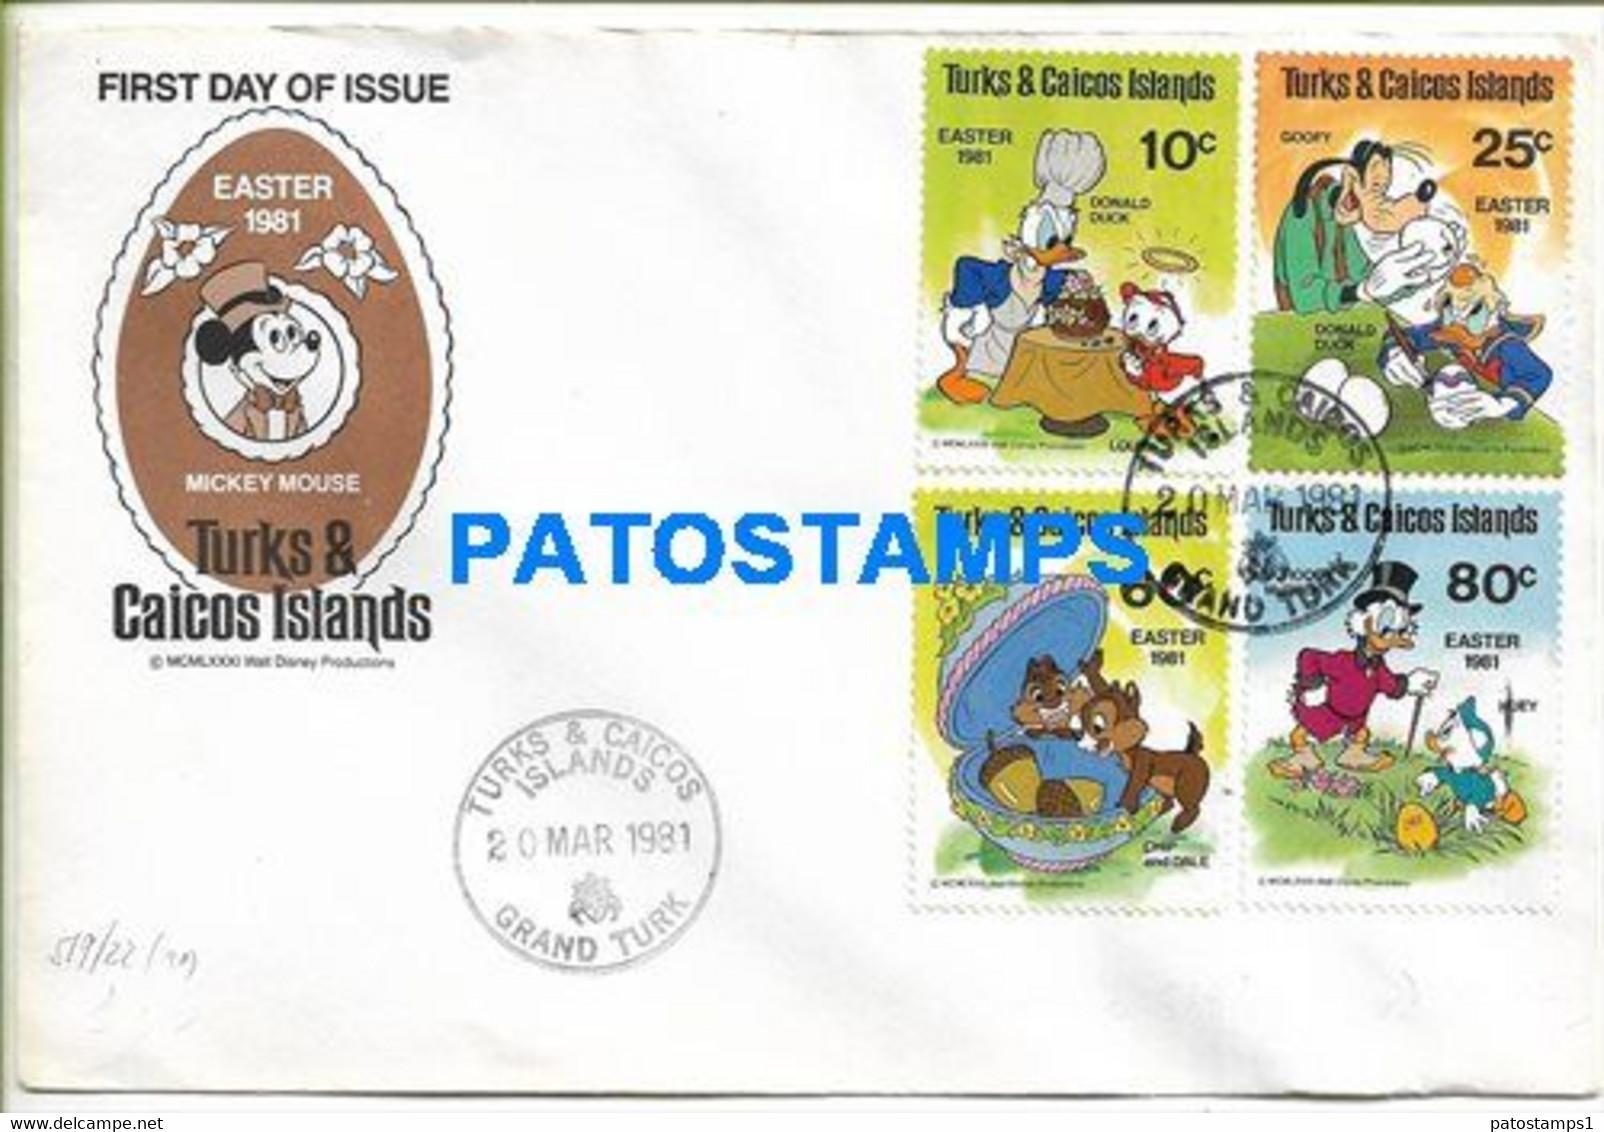 159738 AMERICA TURKS & CAICOS ISLANDS GRAND TURK COVER YEAR 1981 CANCEL MICKEY MOUSE DISNEY NO POSTAL POSTCARD - Turks & Caicos